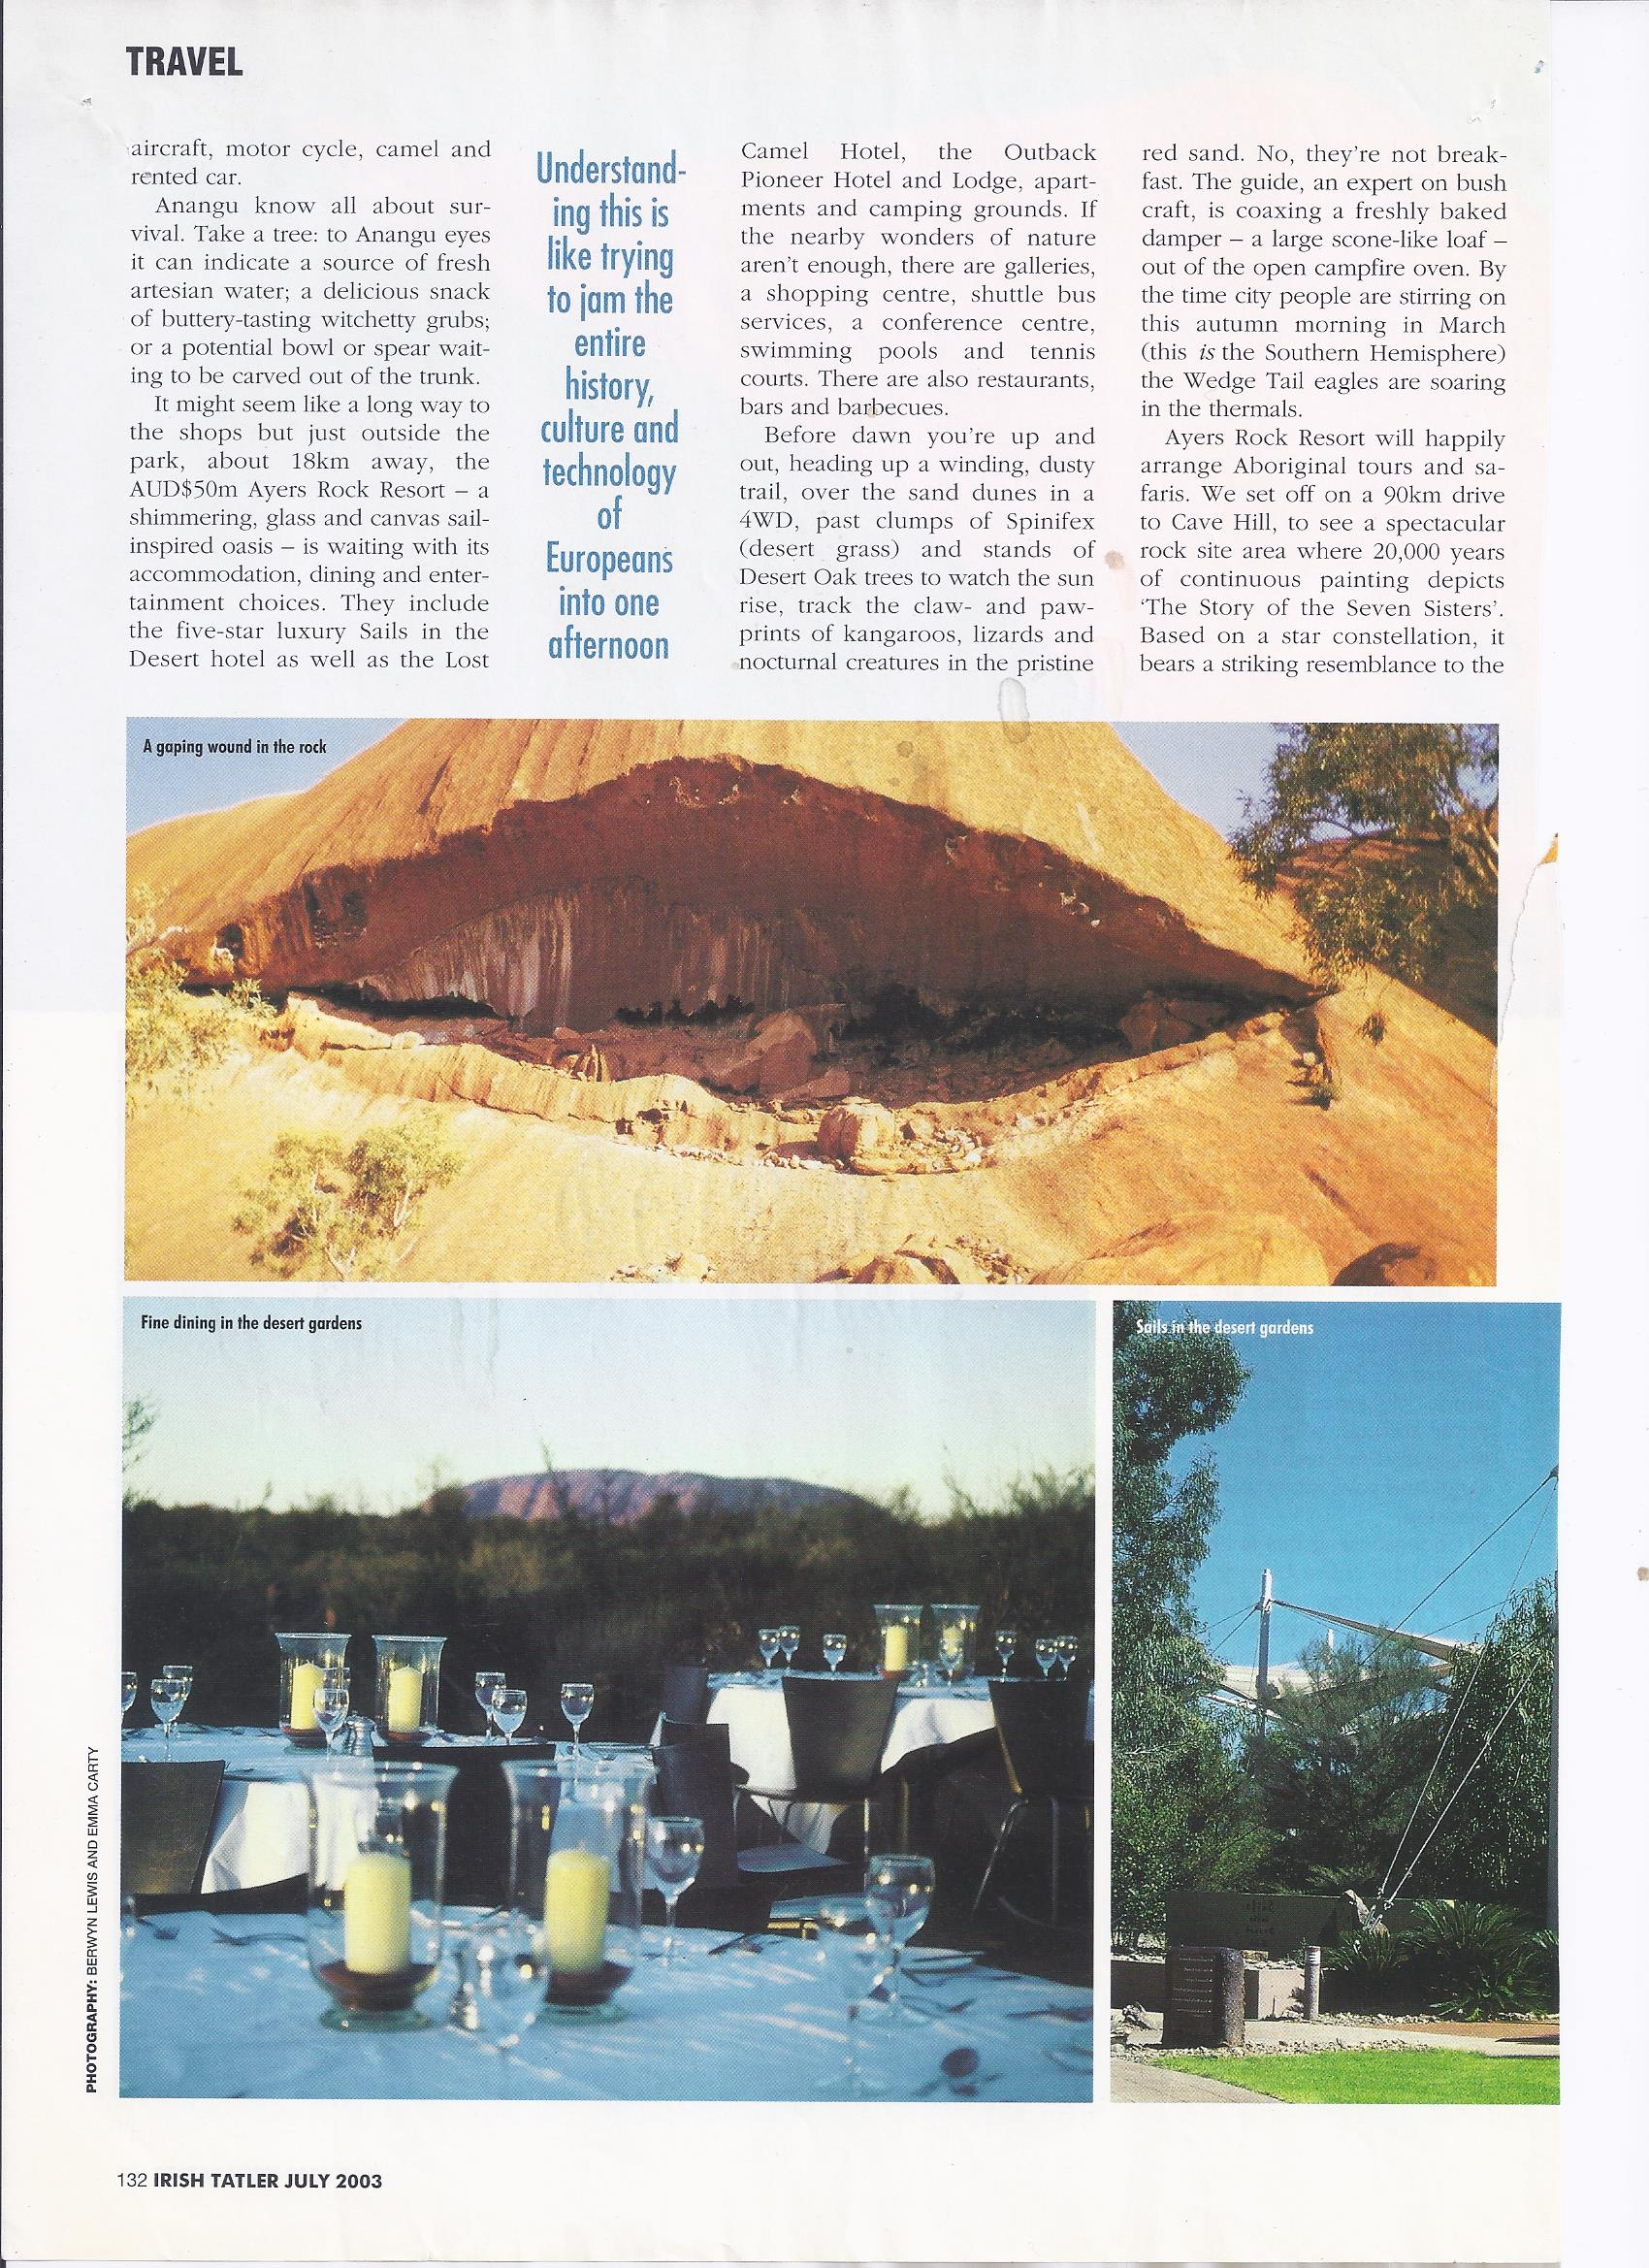 Desert Date Uluru and Kata Tjuta0003.jpg